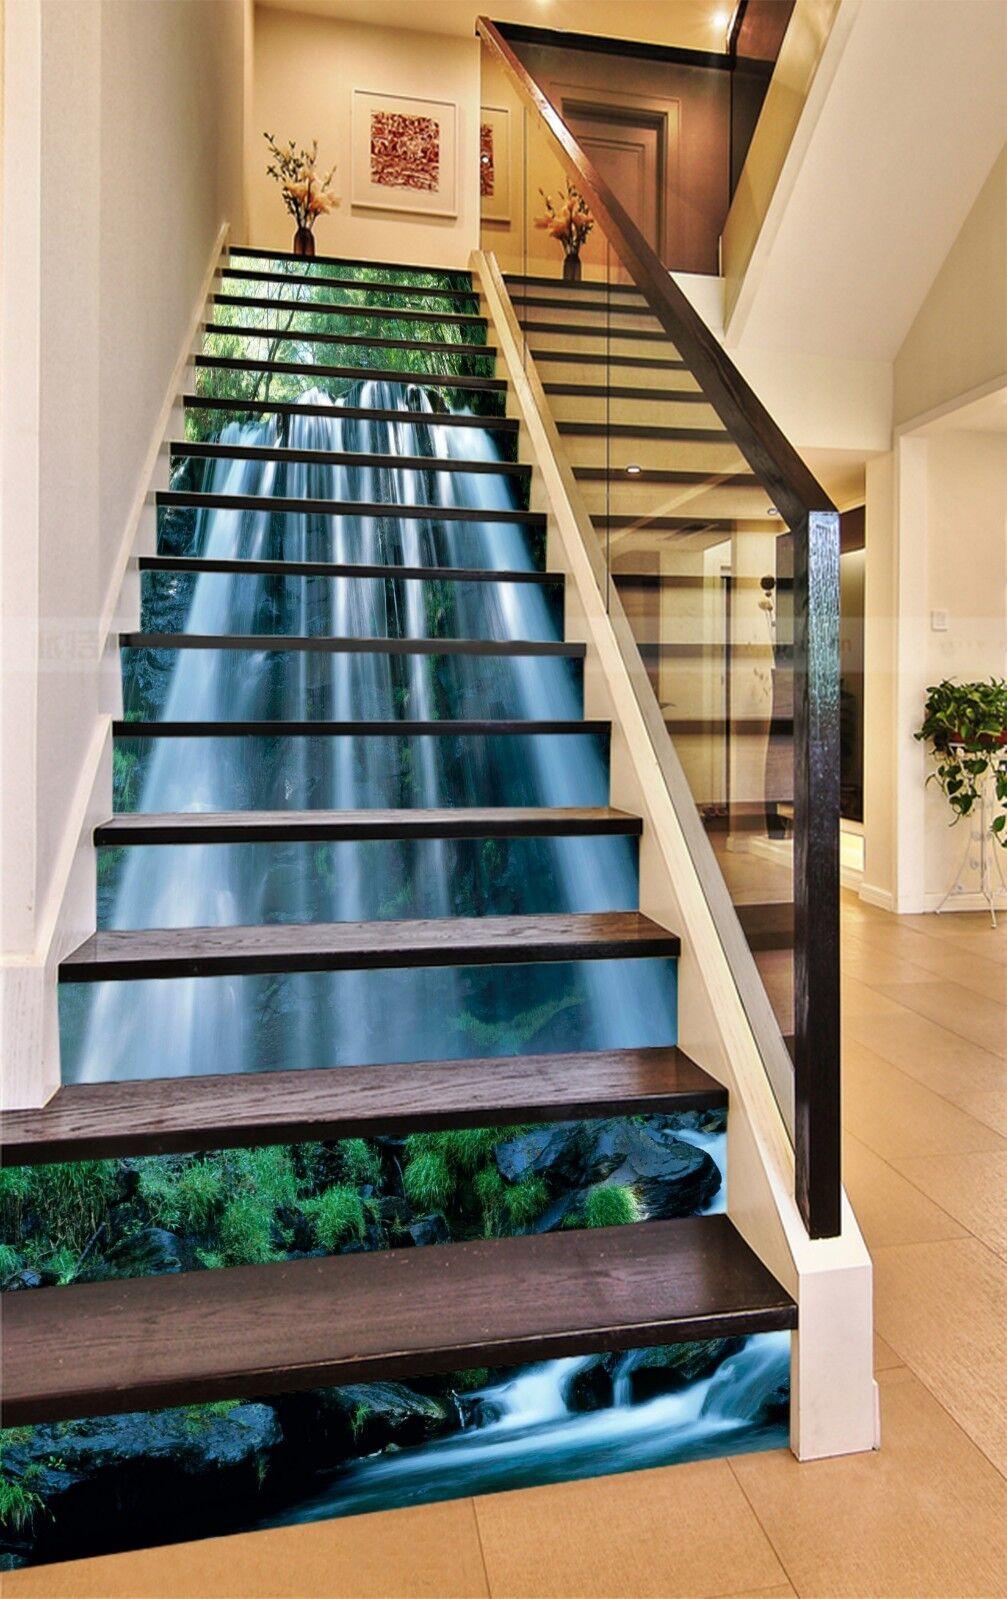 3D Waterfall Sun 3 Stair Risers Decoration Photo Mural Vinyl Decal Wallpaper CA